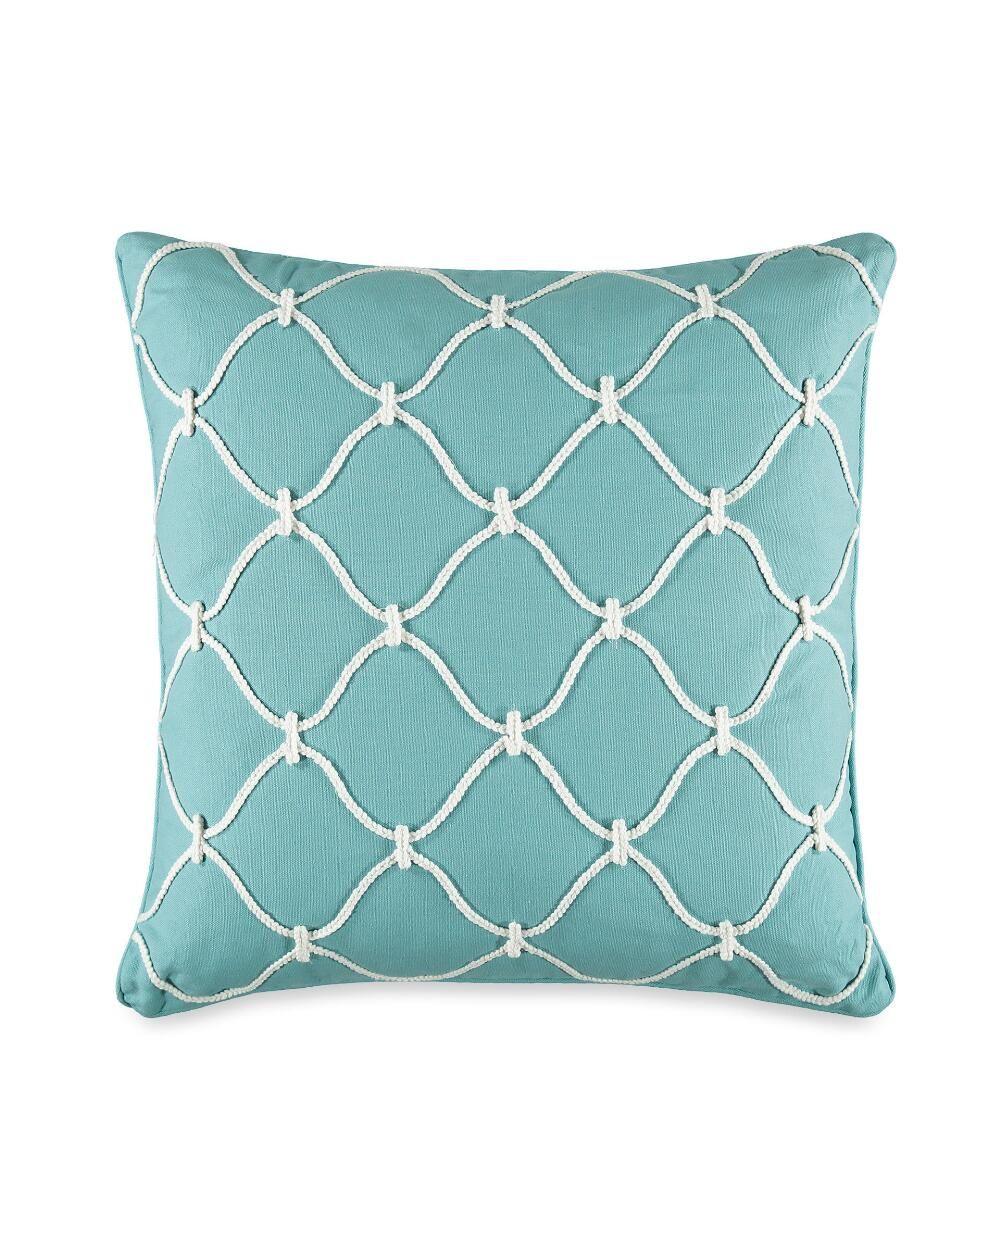 Stein mart bathroom accessories - Rope Lattice Decorative Pillow Decorative Pillows Coastal Shops Bed Bath